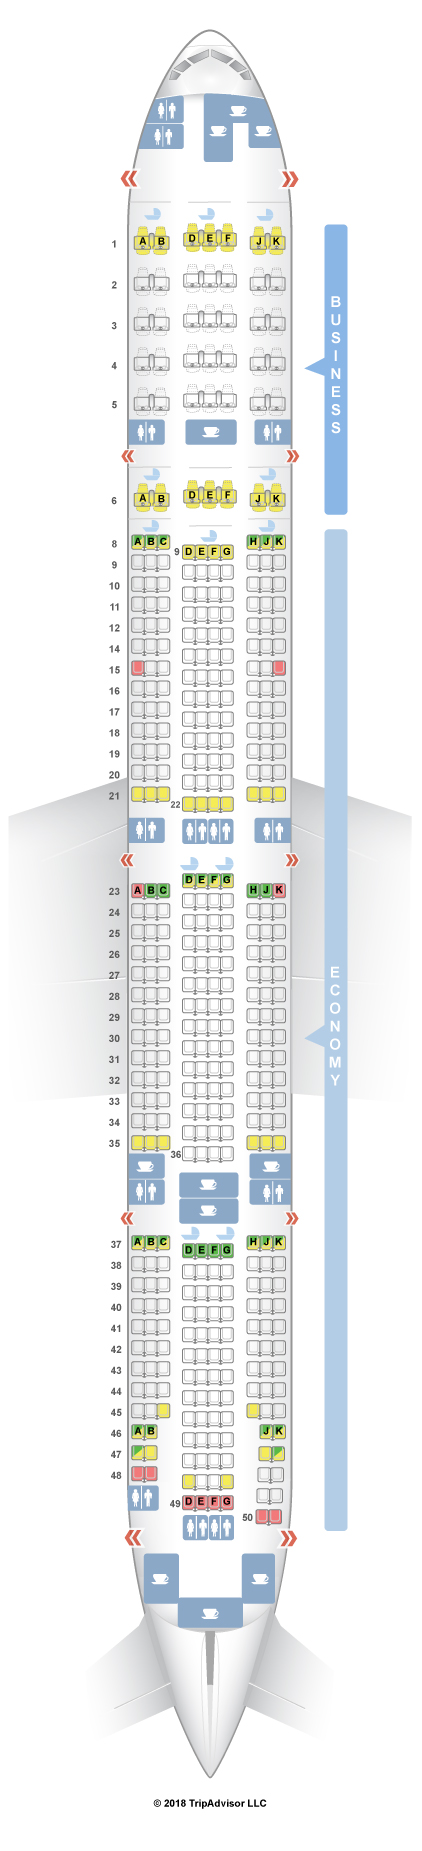 Boeing 777 300Er Seat Map 777 300er Seat Map   OMEU BRECHO Boeing 777 300Er Seat Map